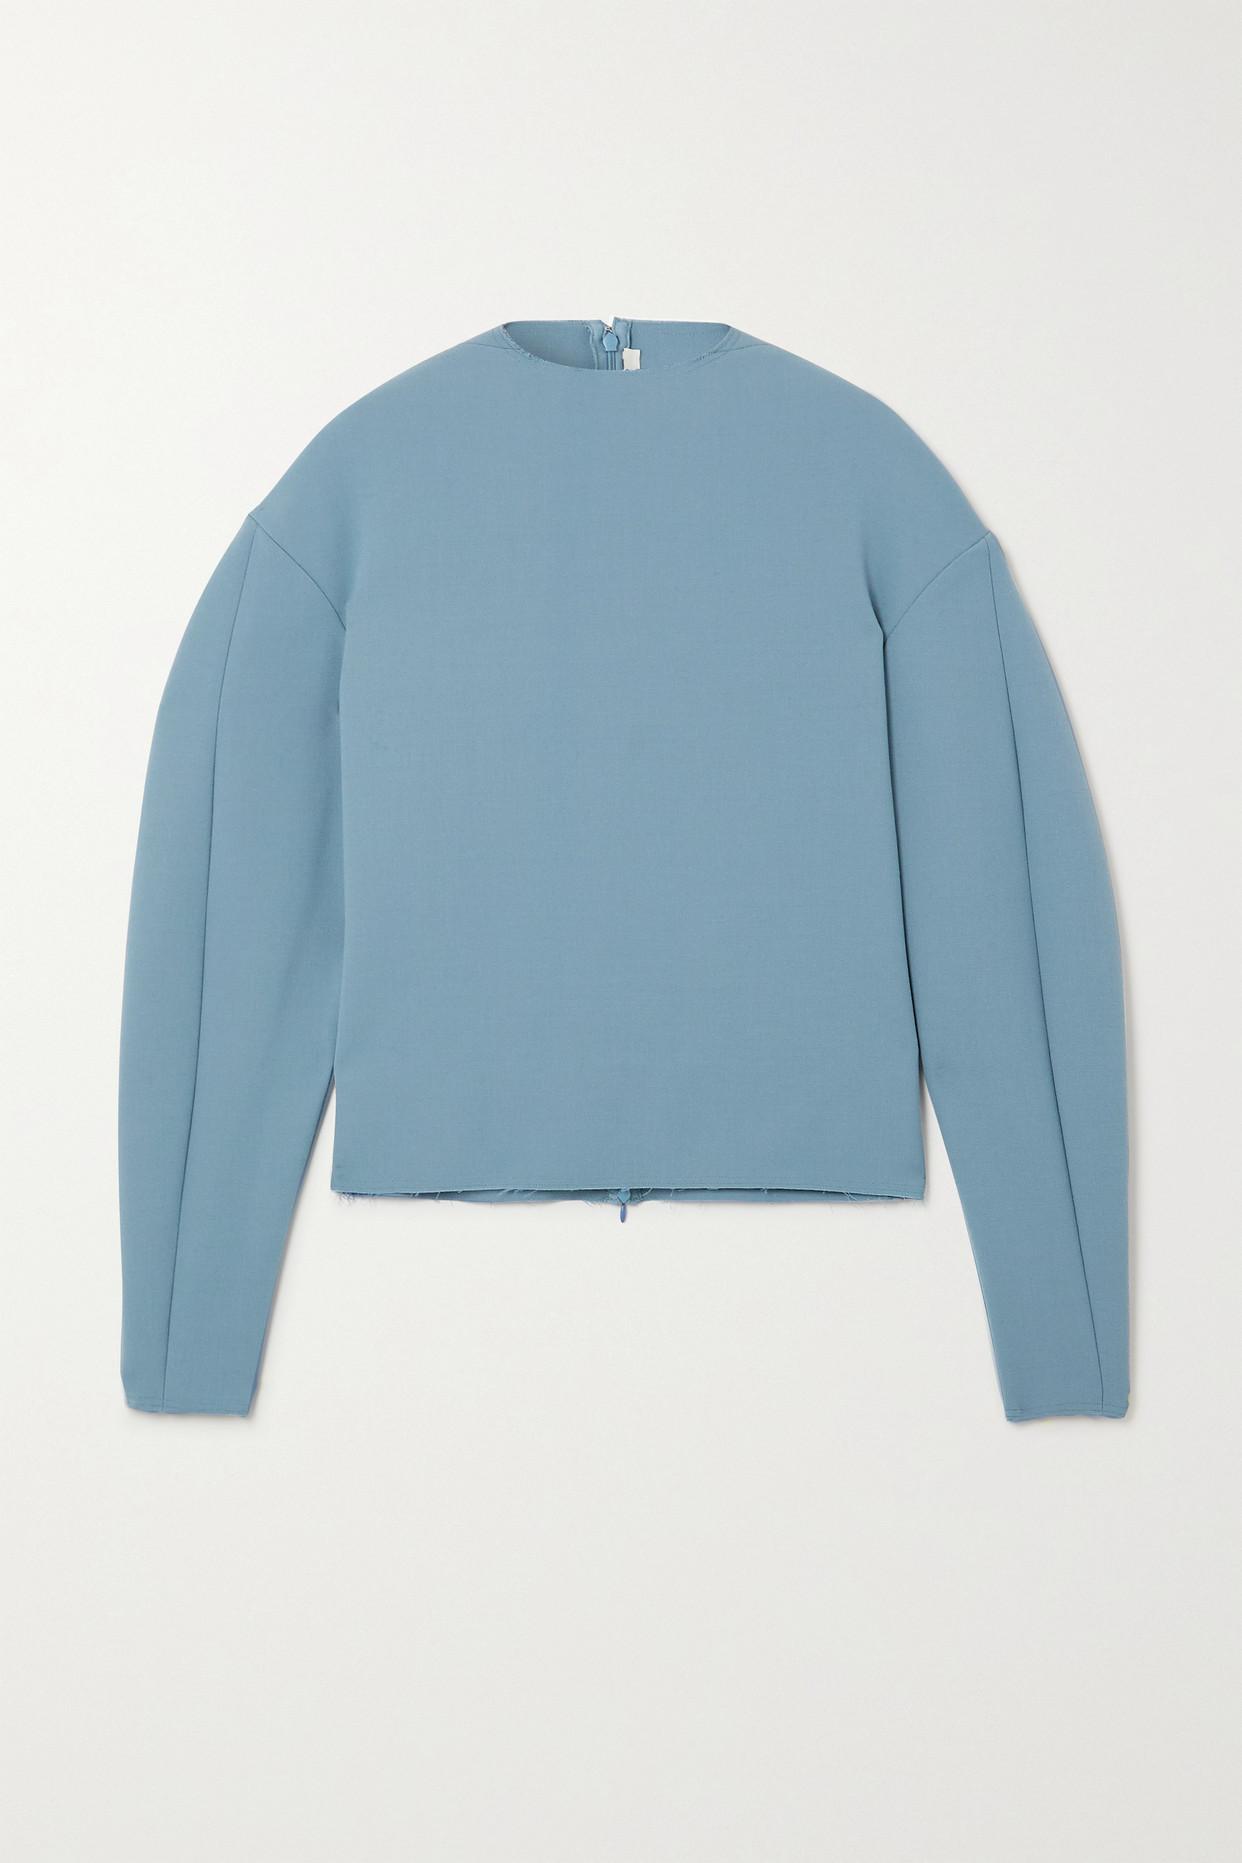 GAUCHERE - Reggie Frayed Wool Top - Blue - FR36